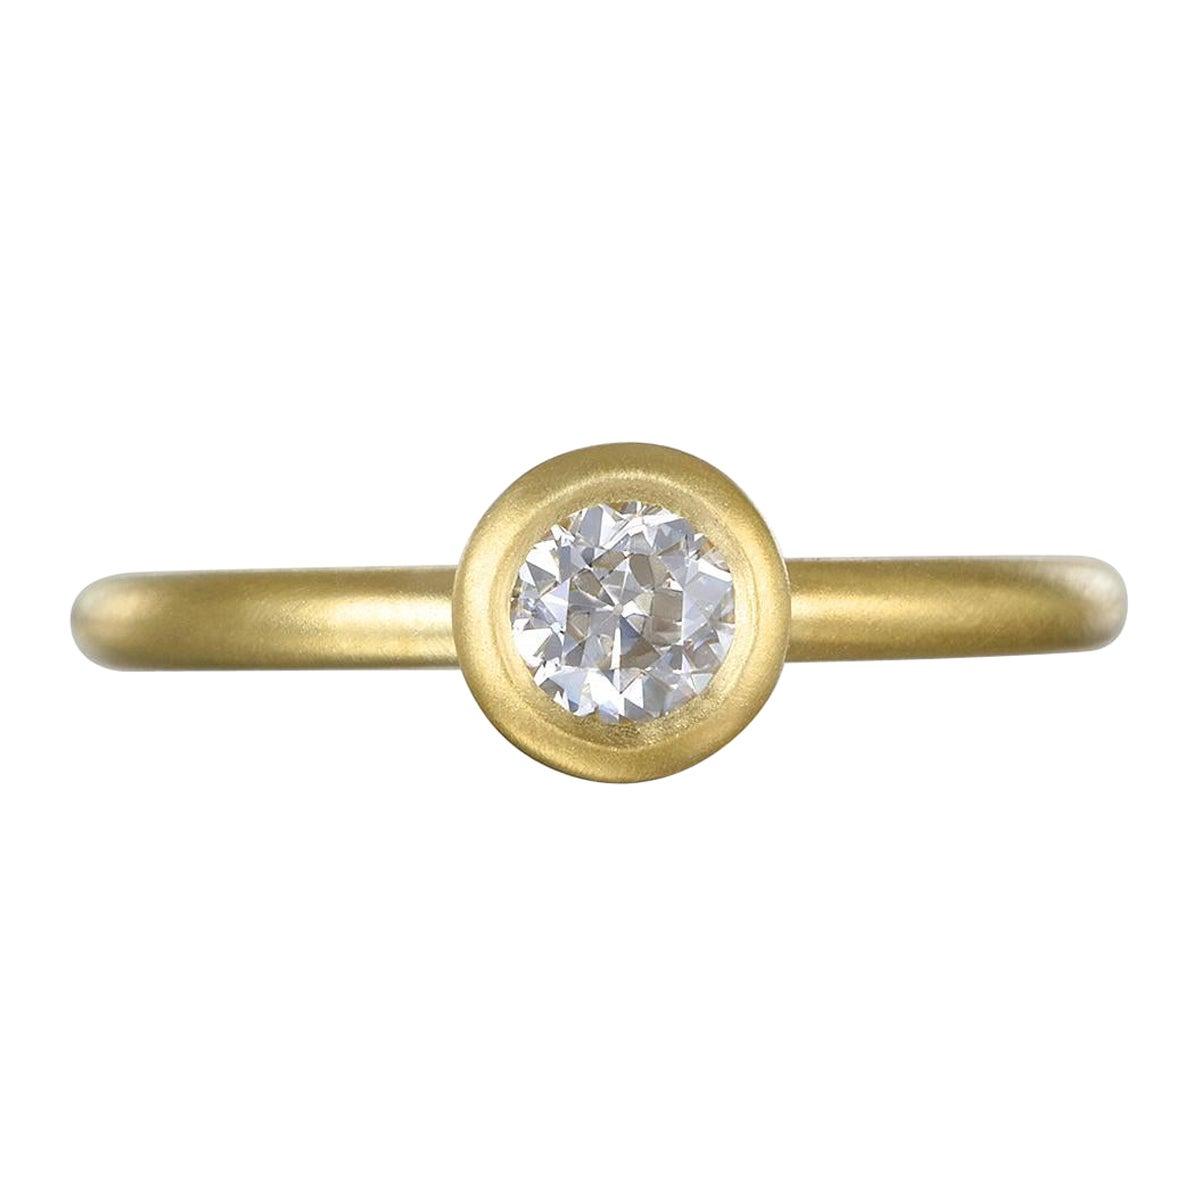 Faye Kim 18k Gold Old European Cut Diamond Ring